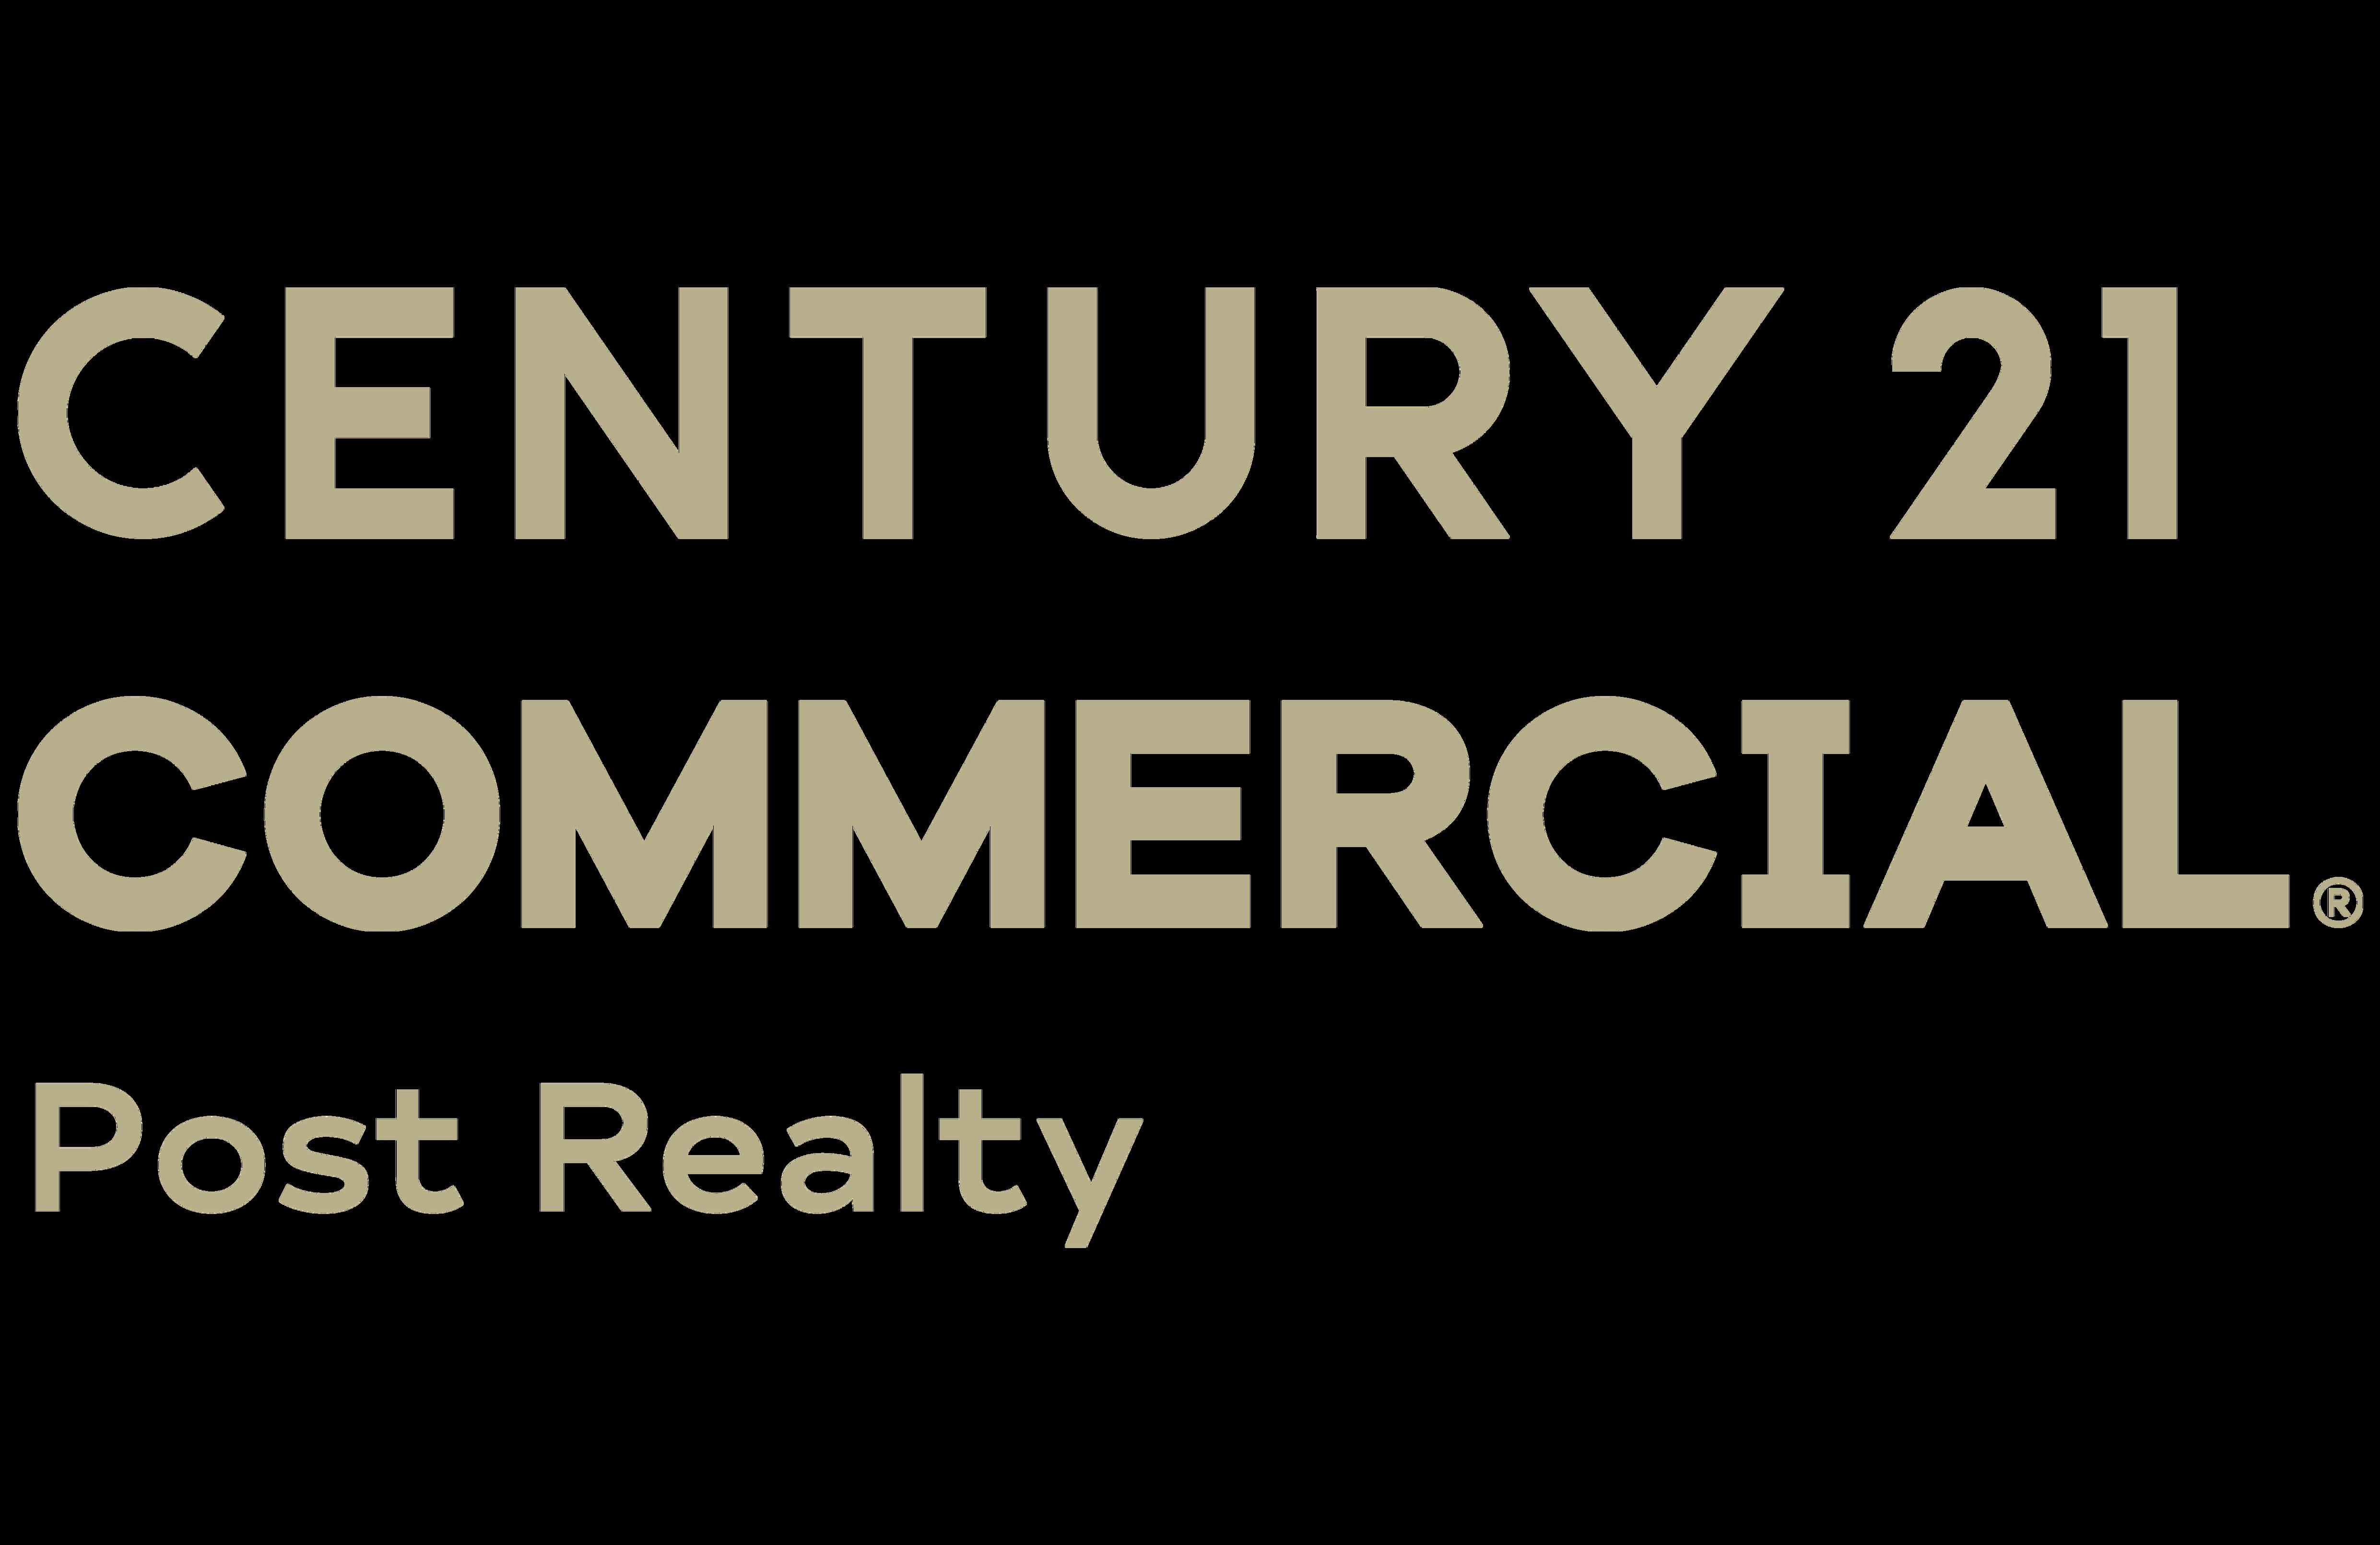 CENTURY 21 Post Realty